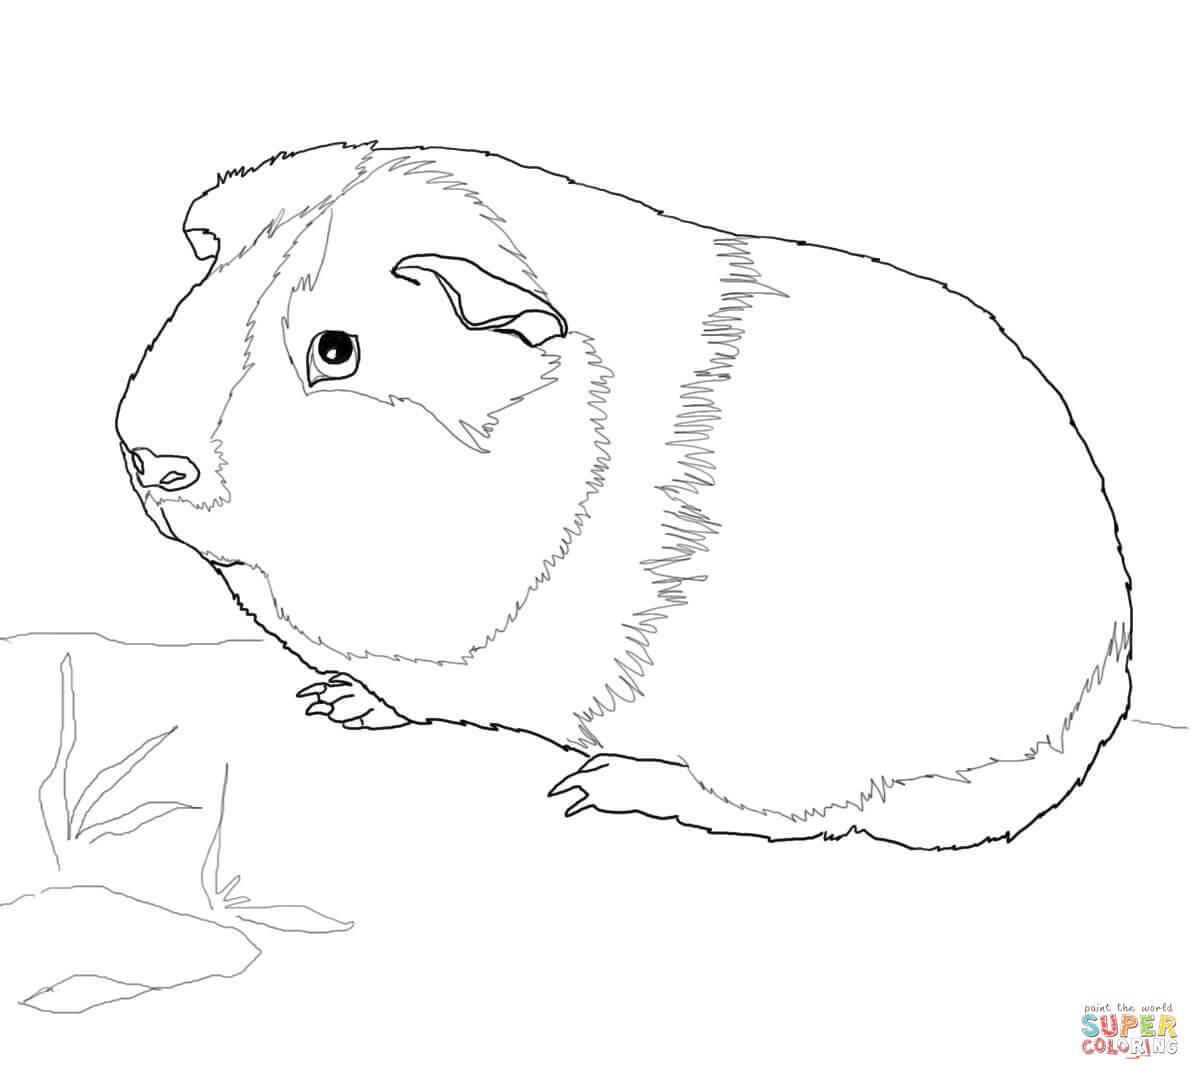 Ausmalbild: Süßes Meerschweinchen   Ausmalbilder Kostenlos mit Ausmalbild Meerschweinchen